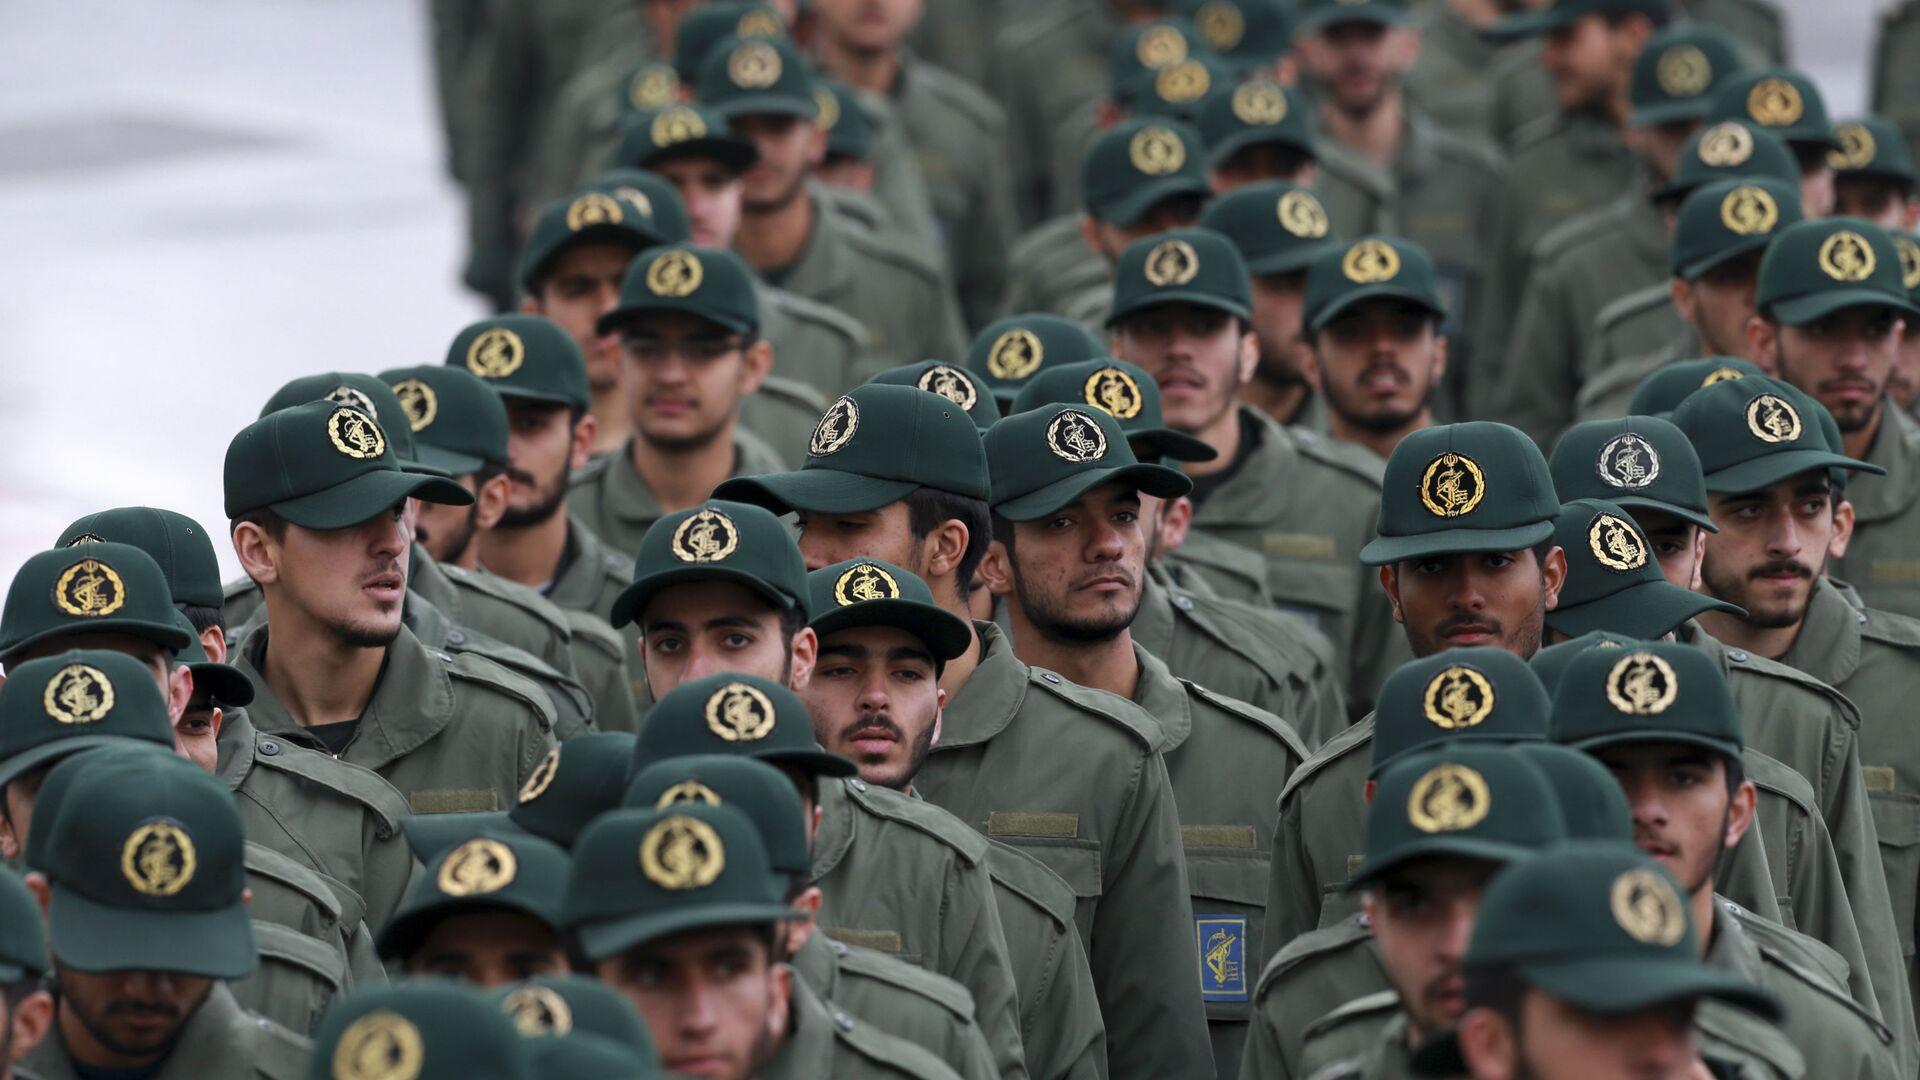 Islamska revolucionarna garda Irana (IRG)  - Sputnik Srbija, 1920, 24.07.2021